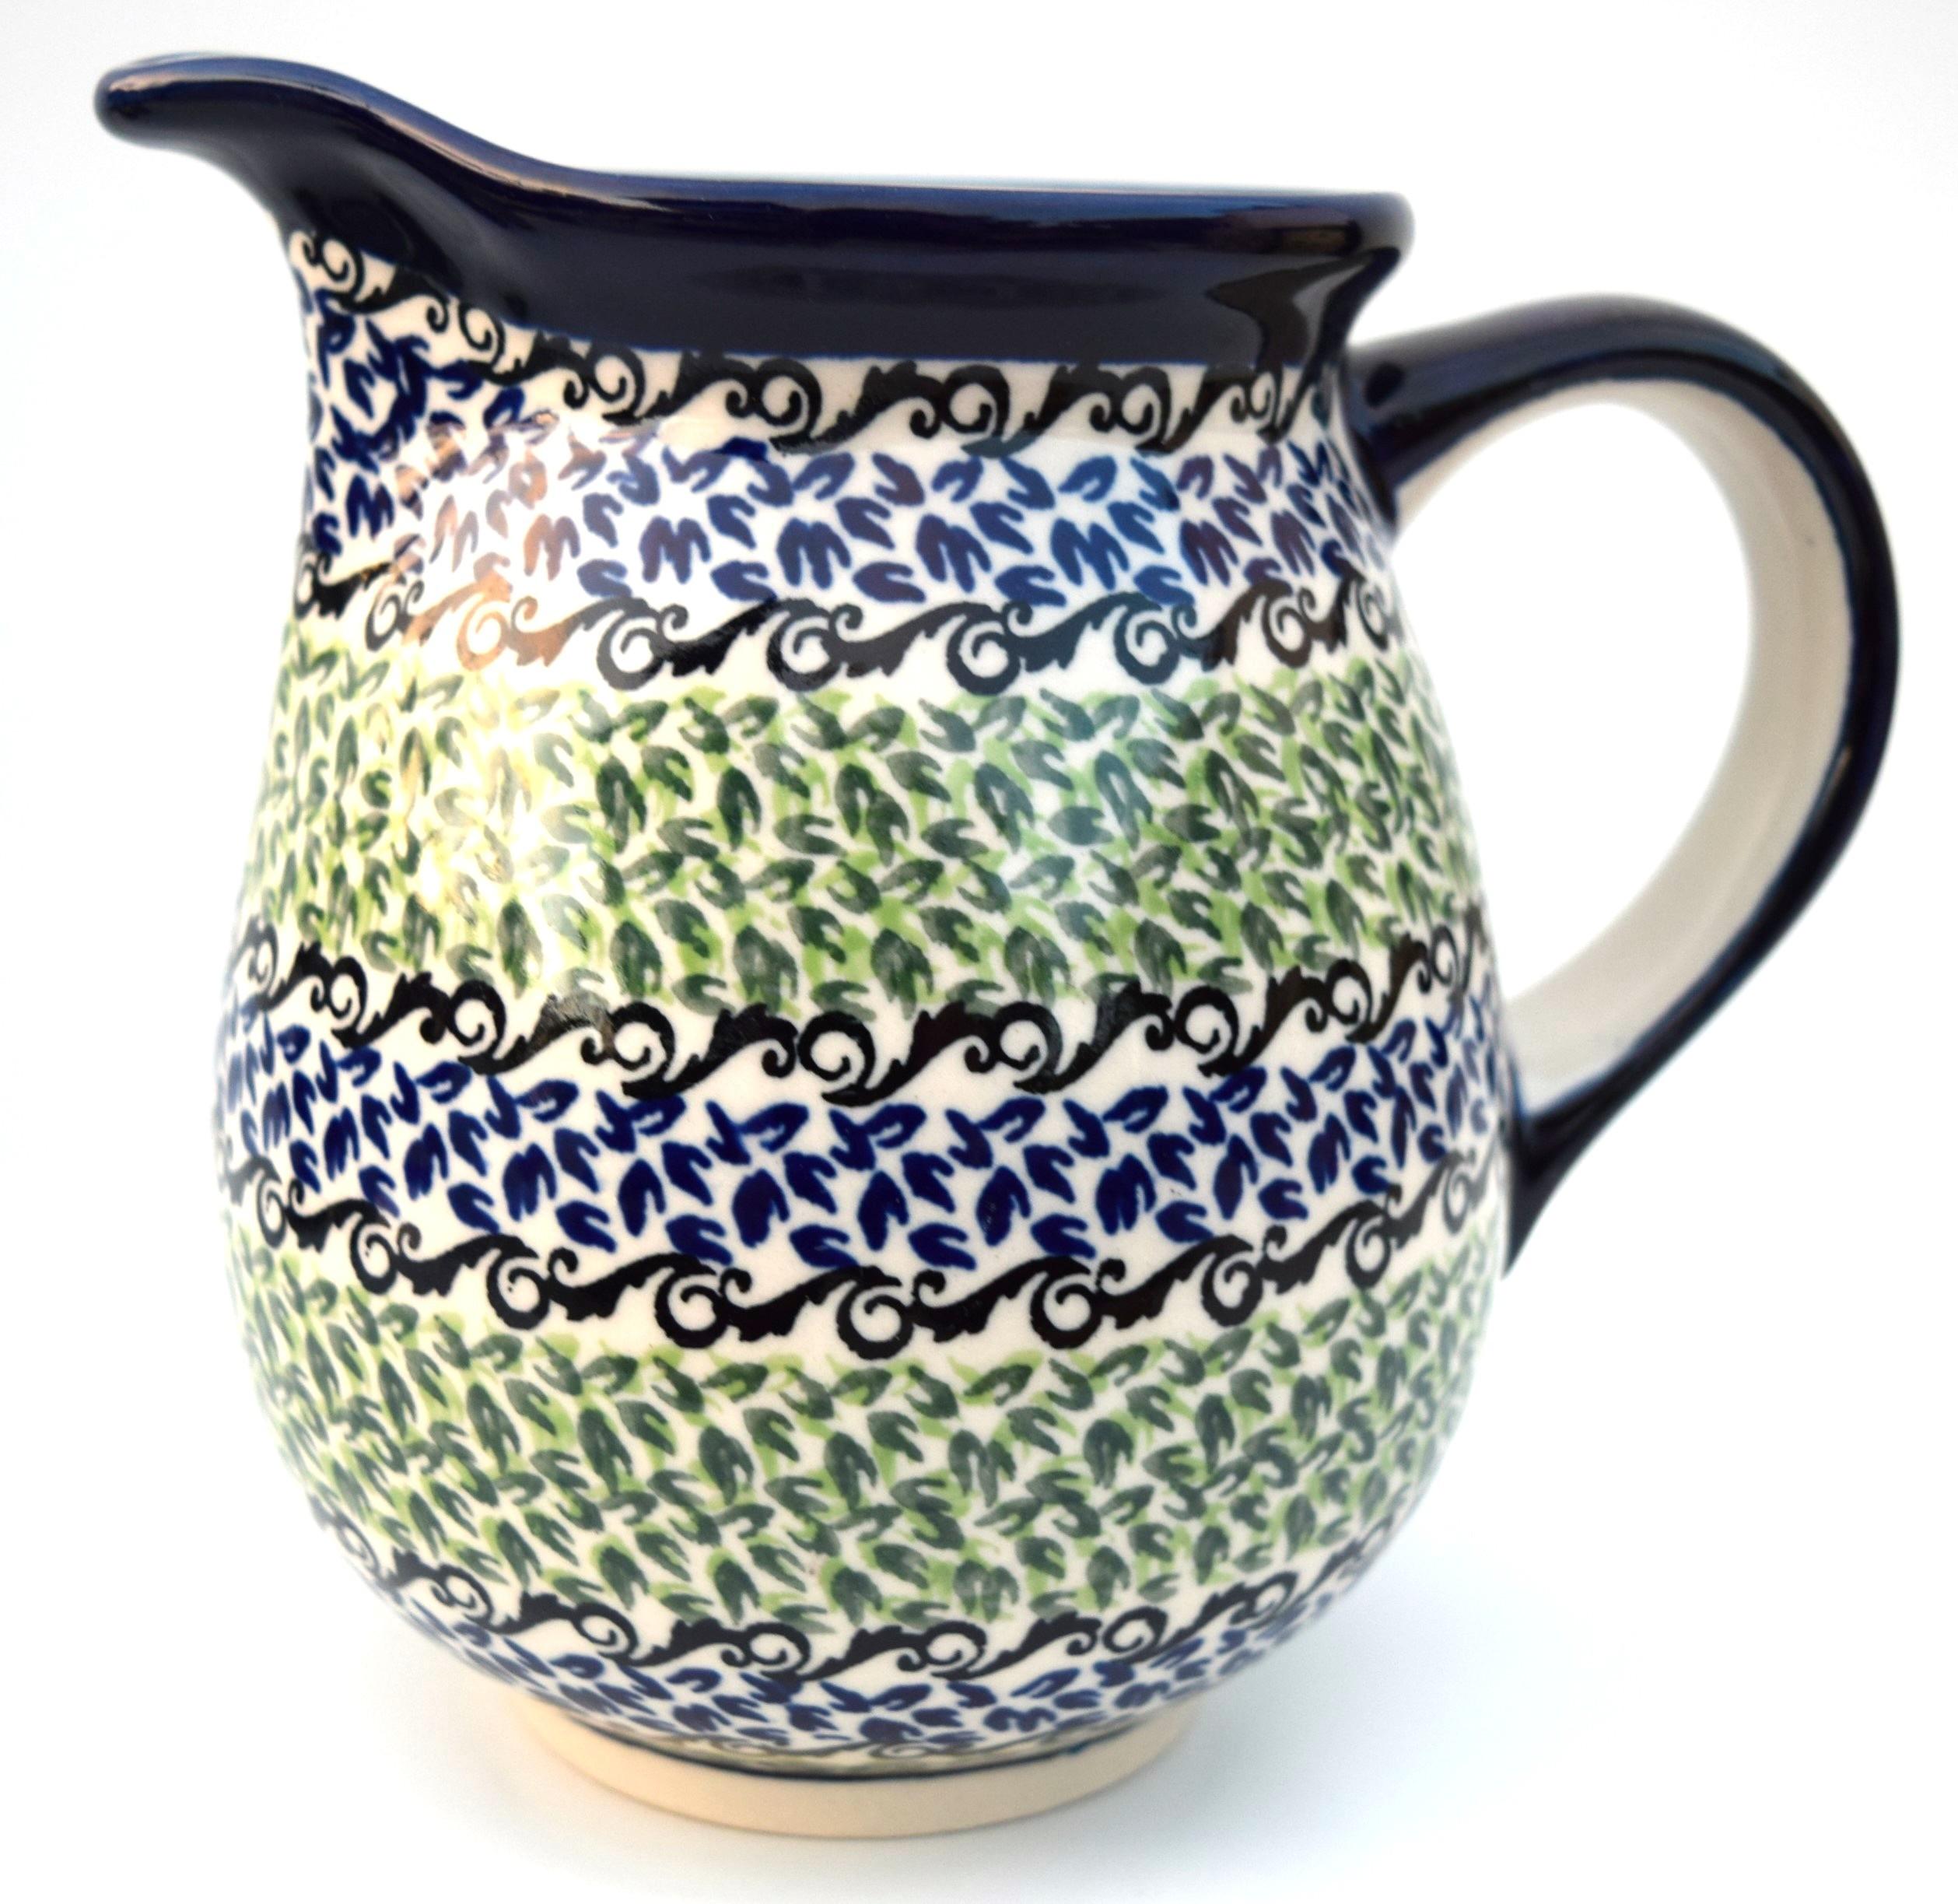 Pottery Avenue 3.6 Cup CELEBRATE Stoneware Pitcher | CLASSIC